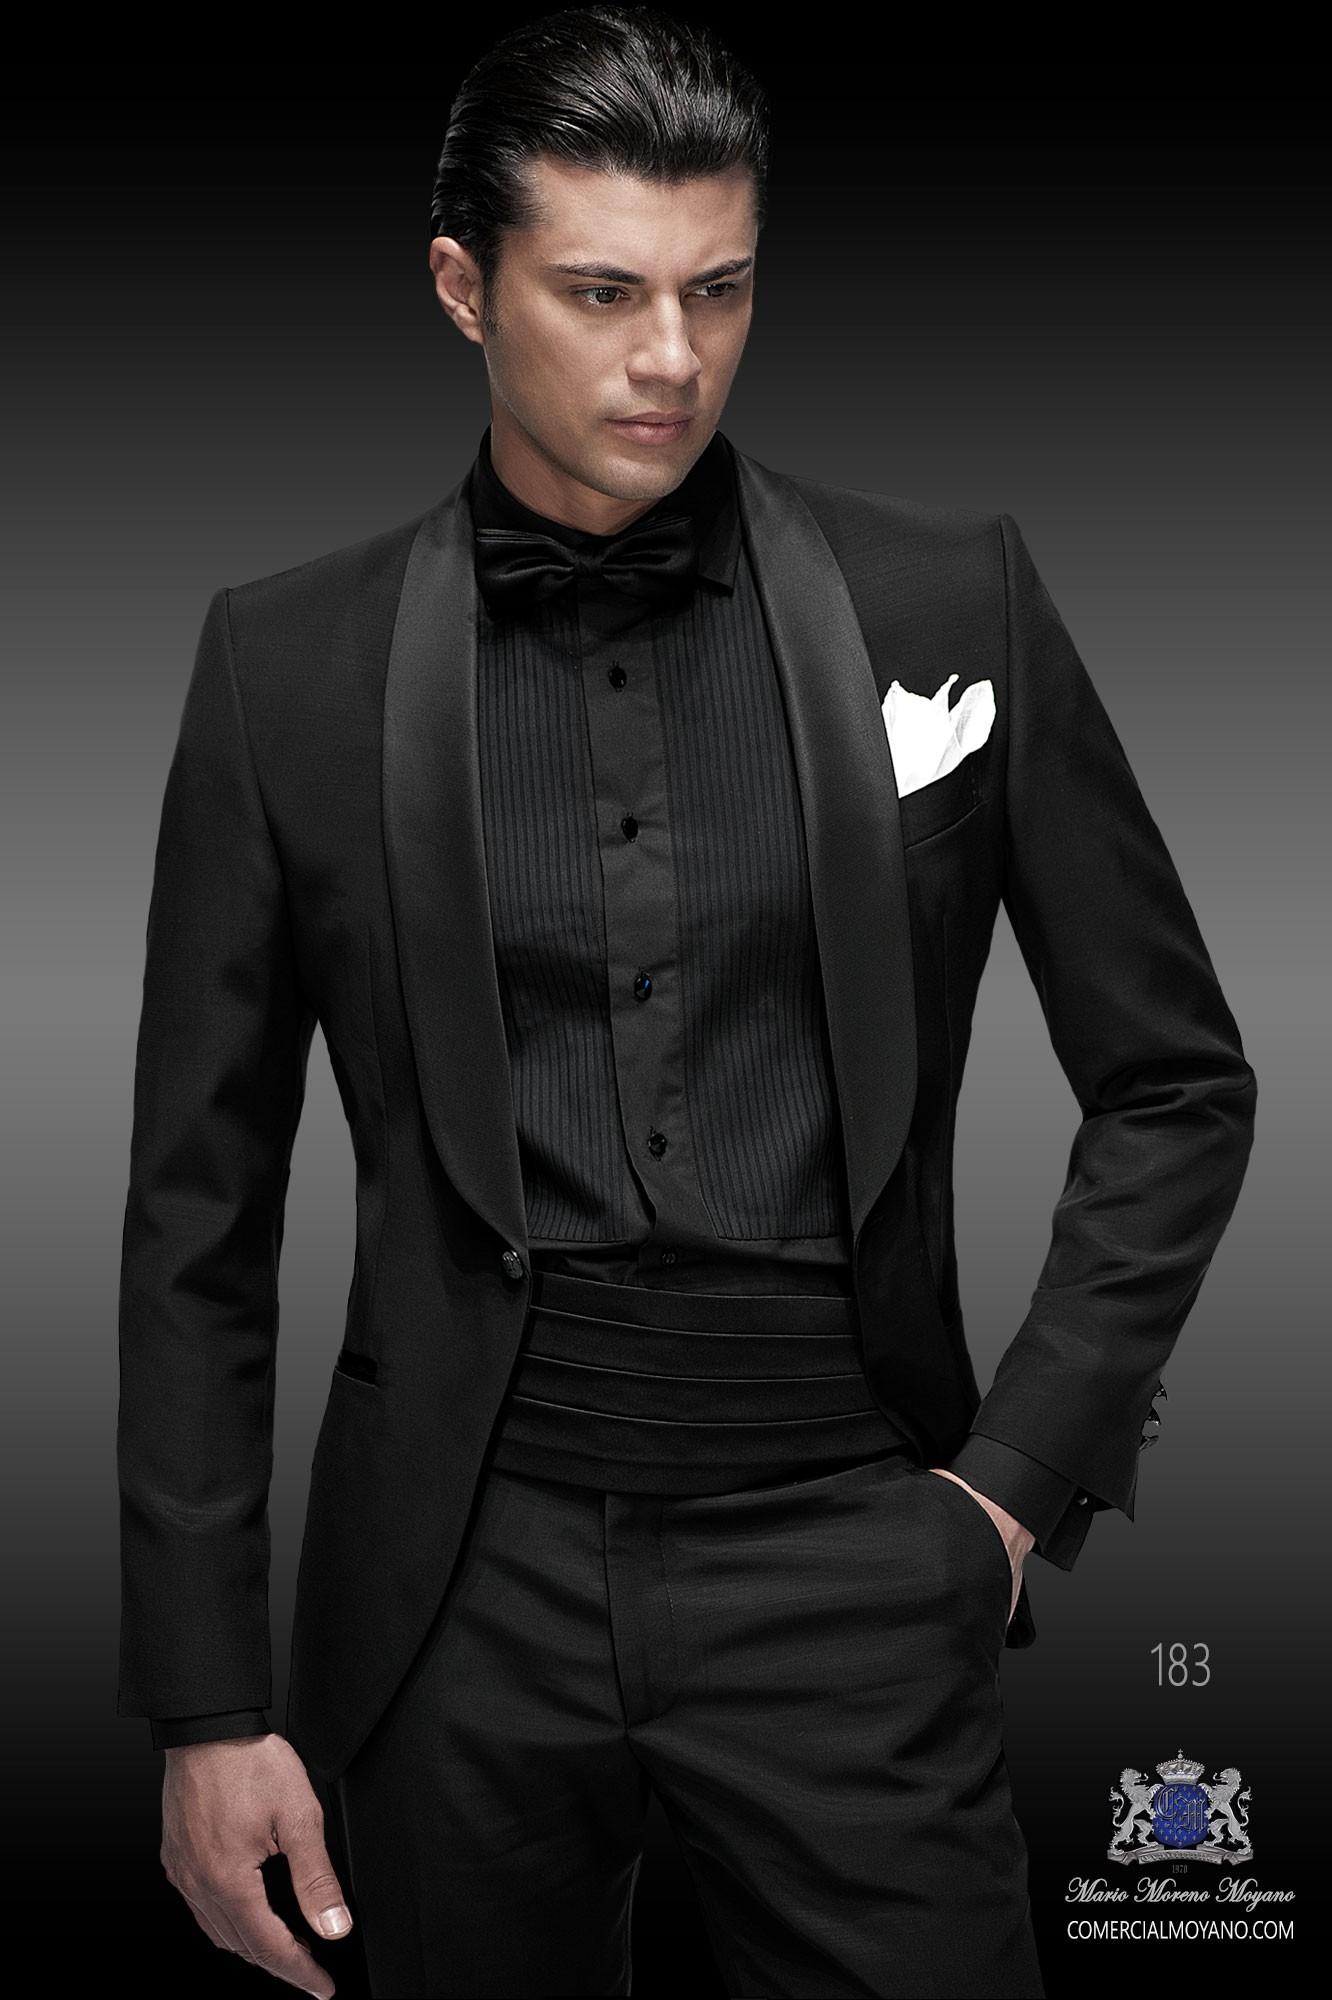 Black Tie black men wedding suit model 183 Ottavio Nuccio Gala